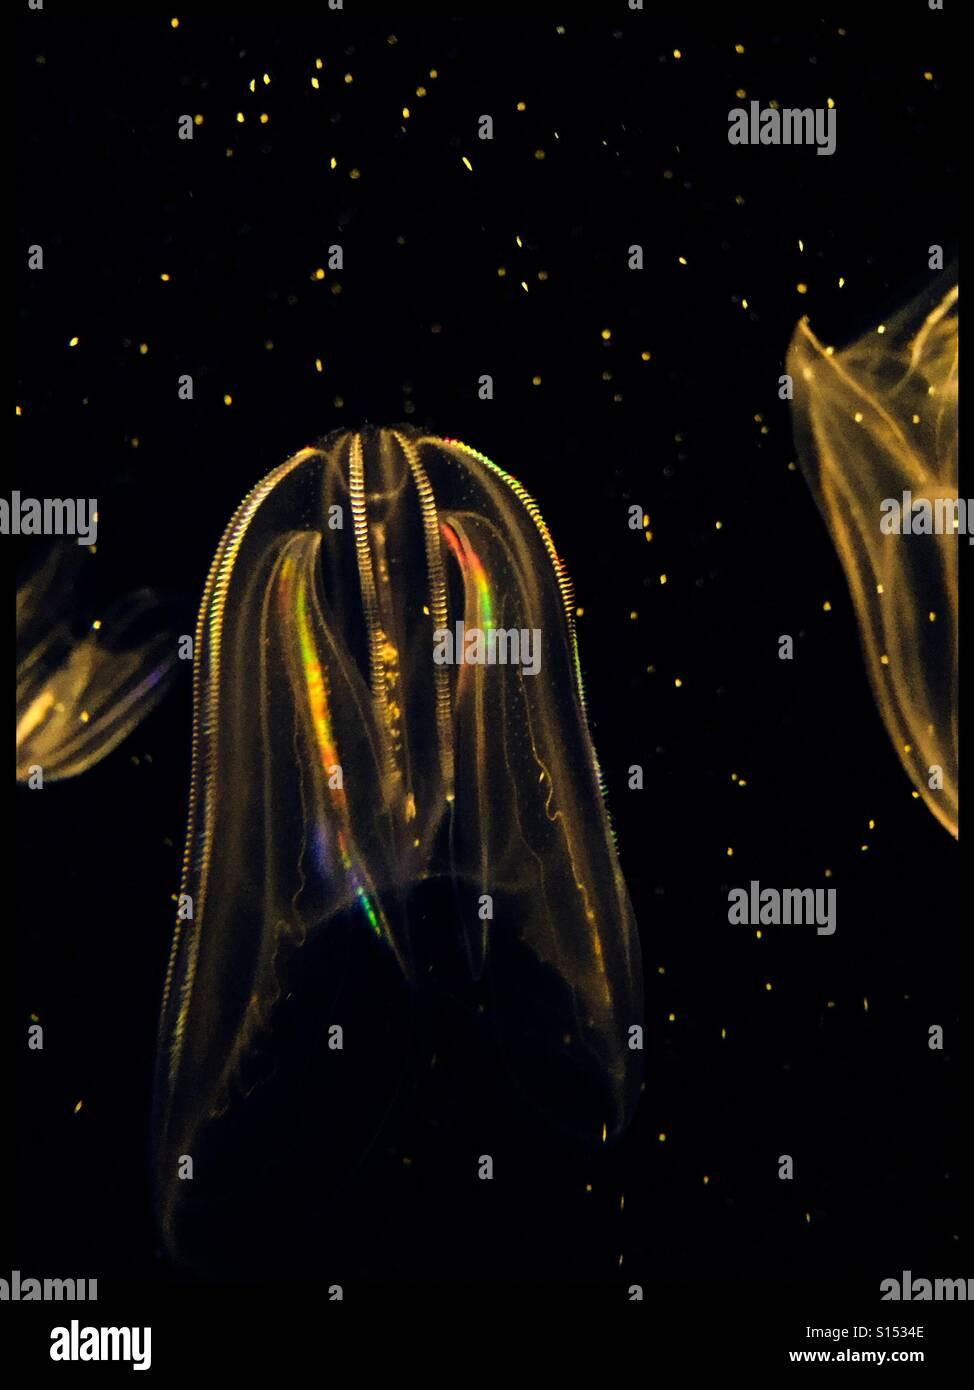 Rainbow colors of jellyfish - Stock Image